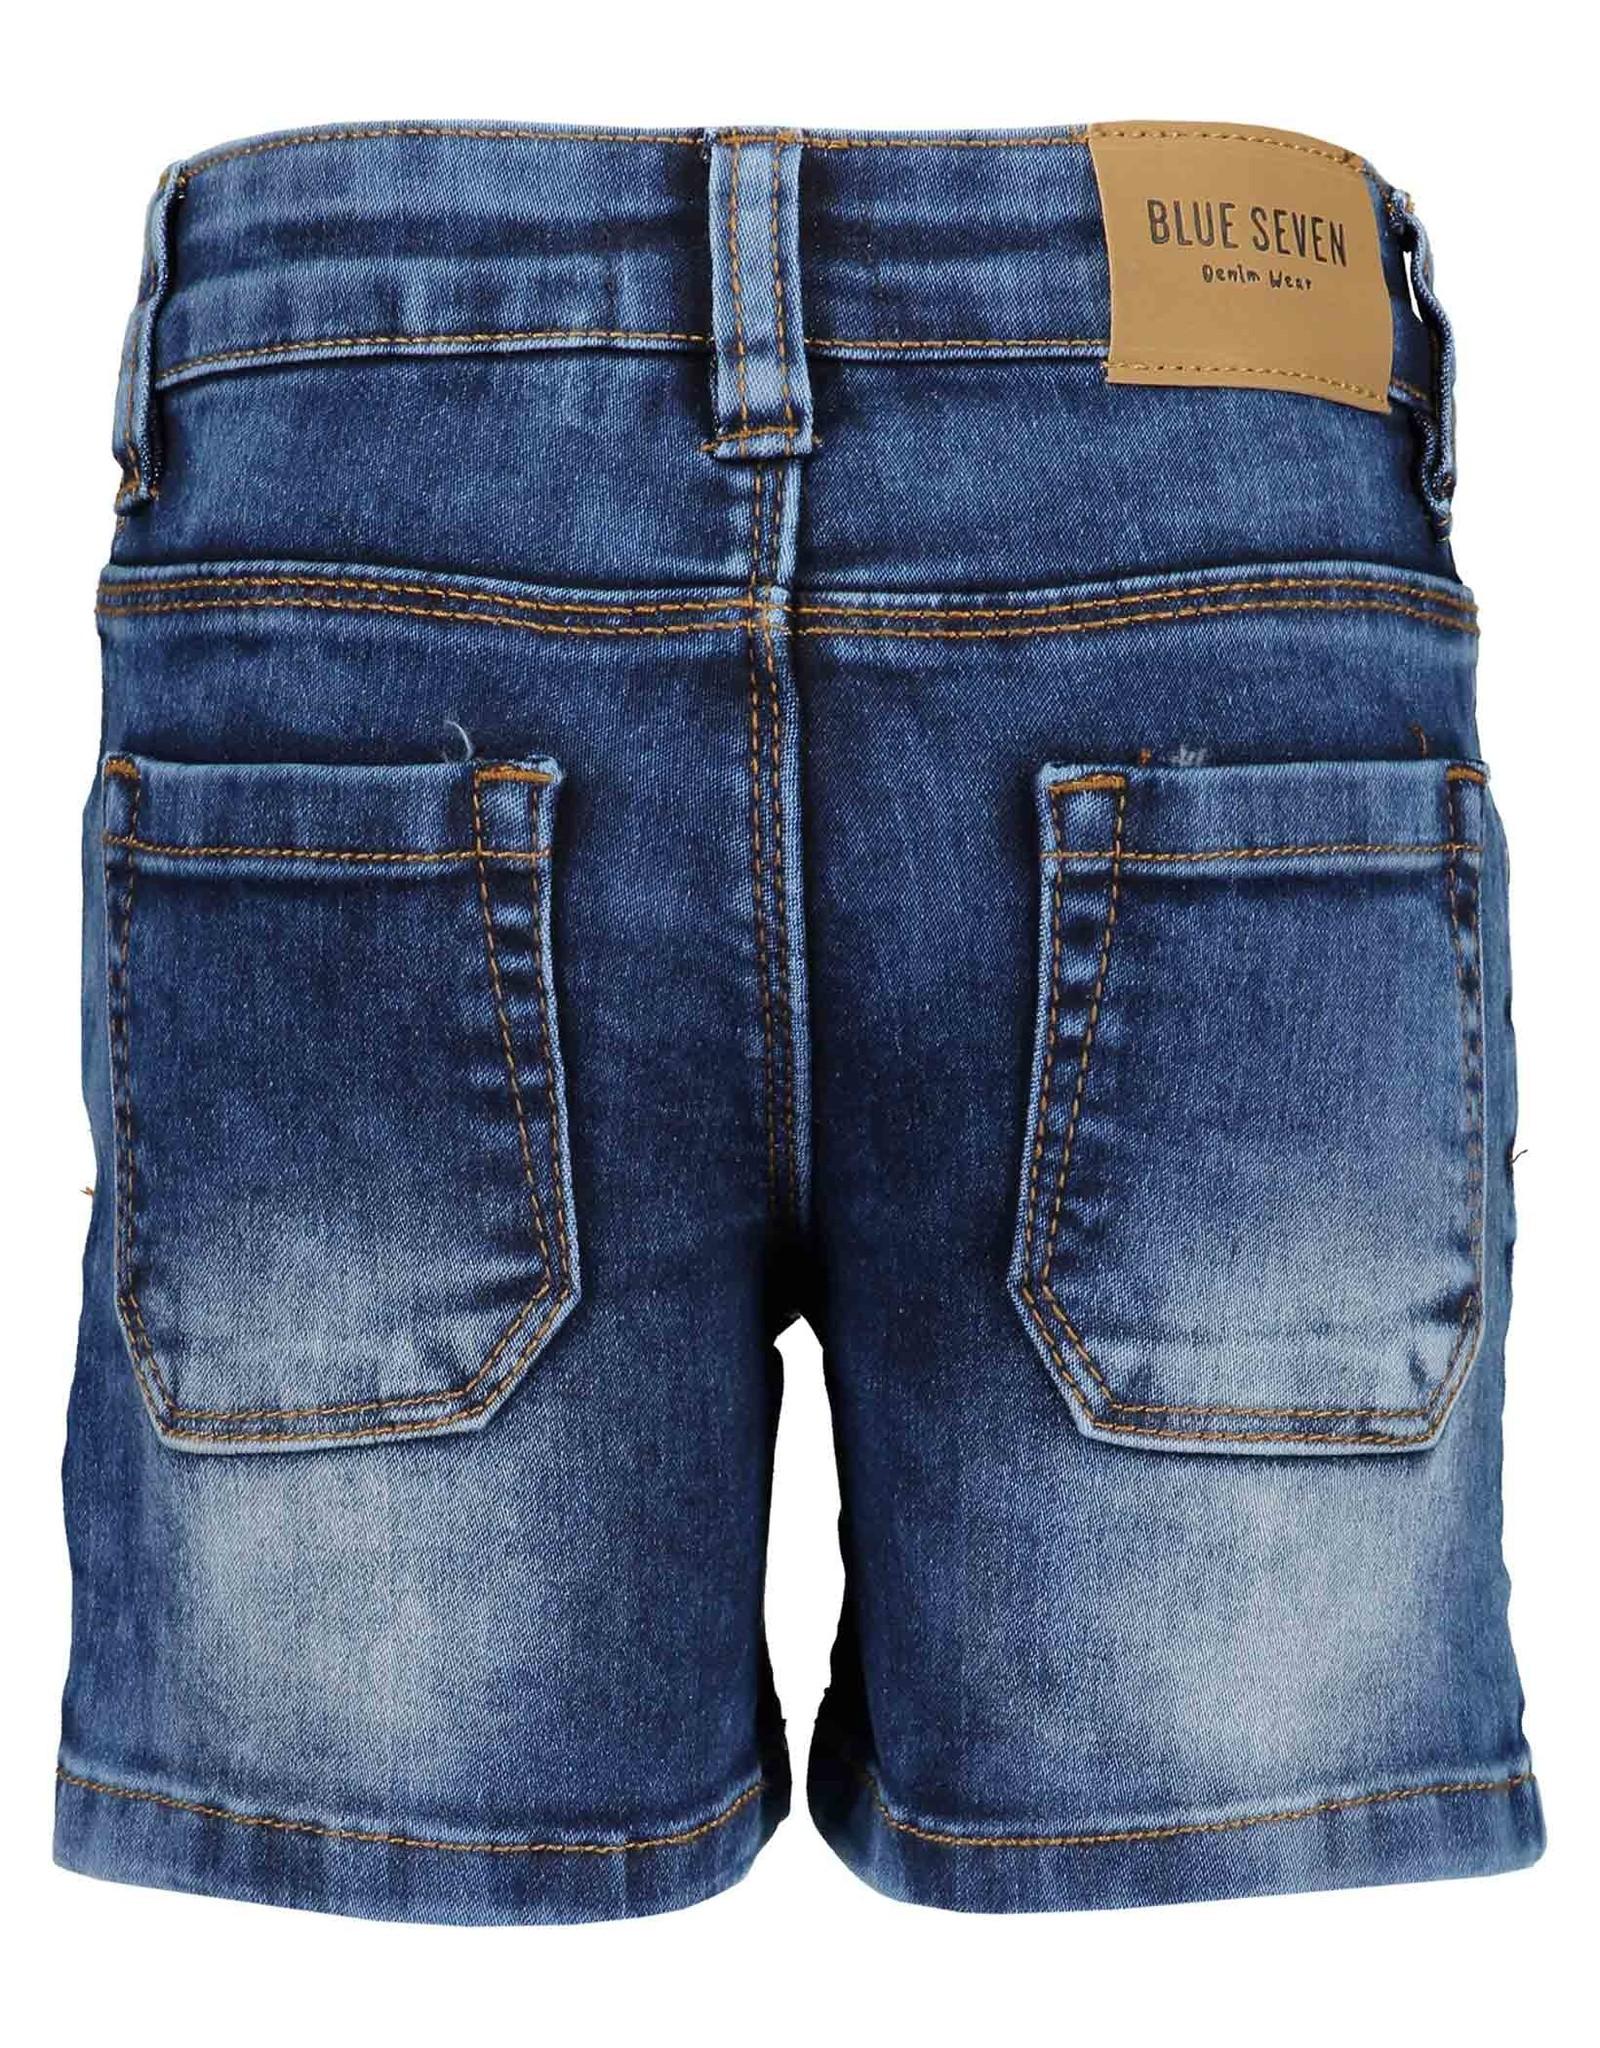 Blue Seven Blue Seven jongens korte jeans Xtreme Cars Jeansblue